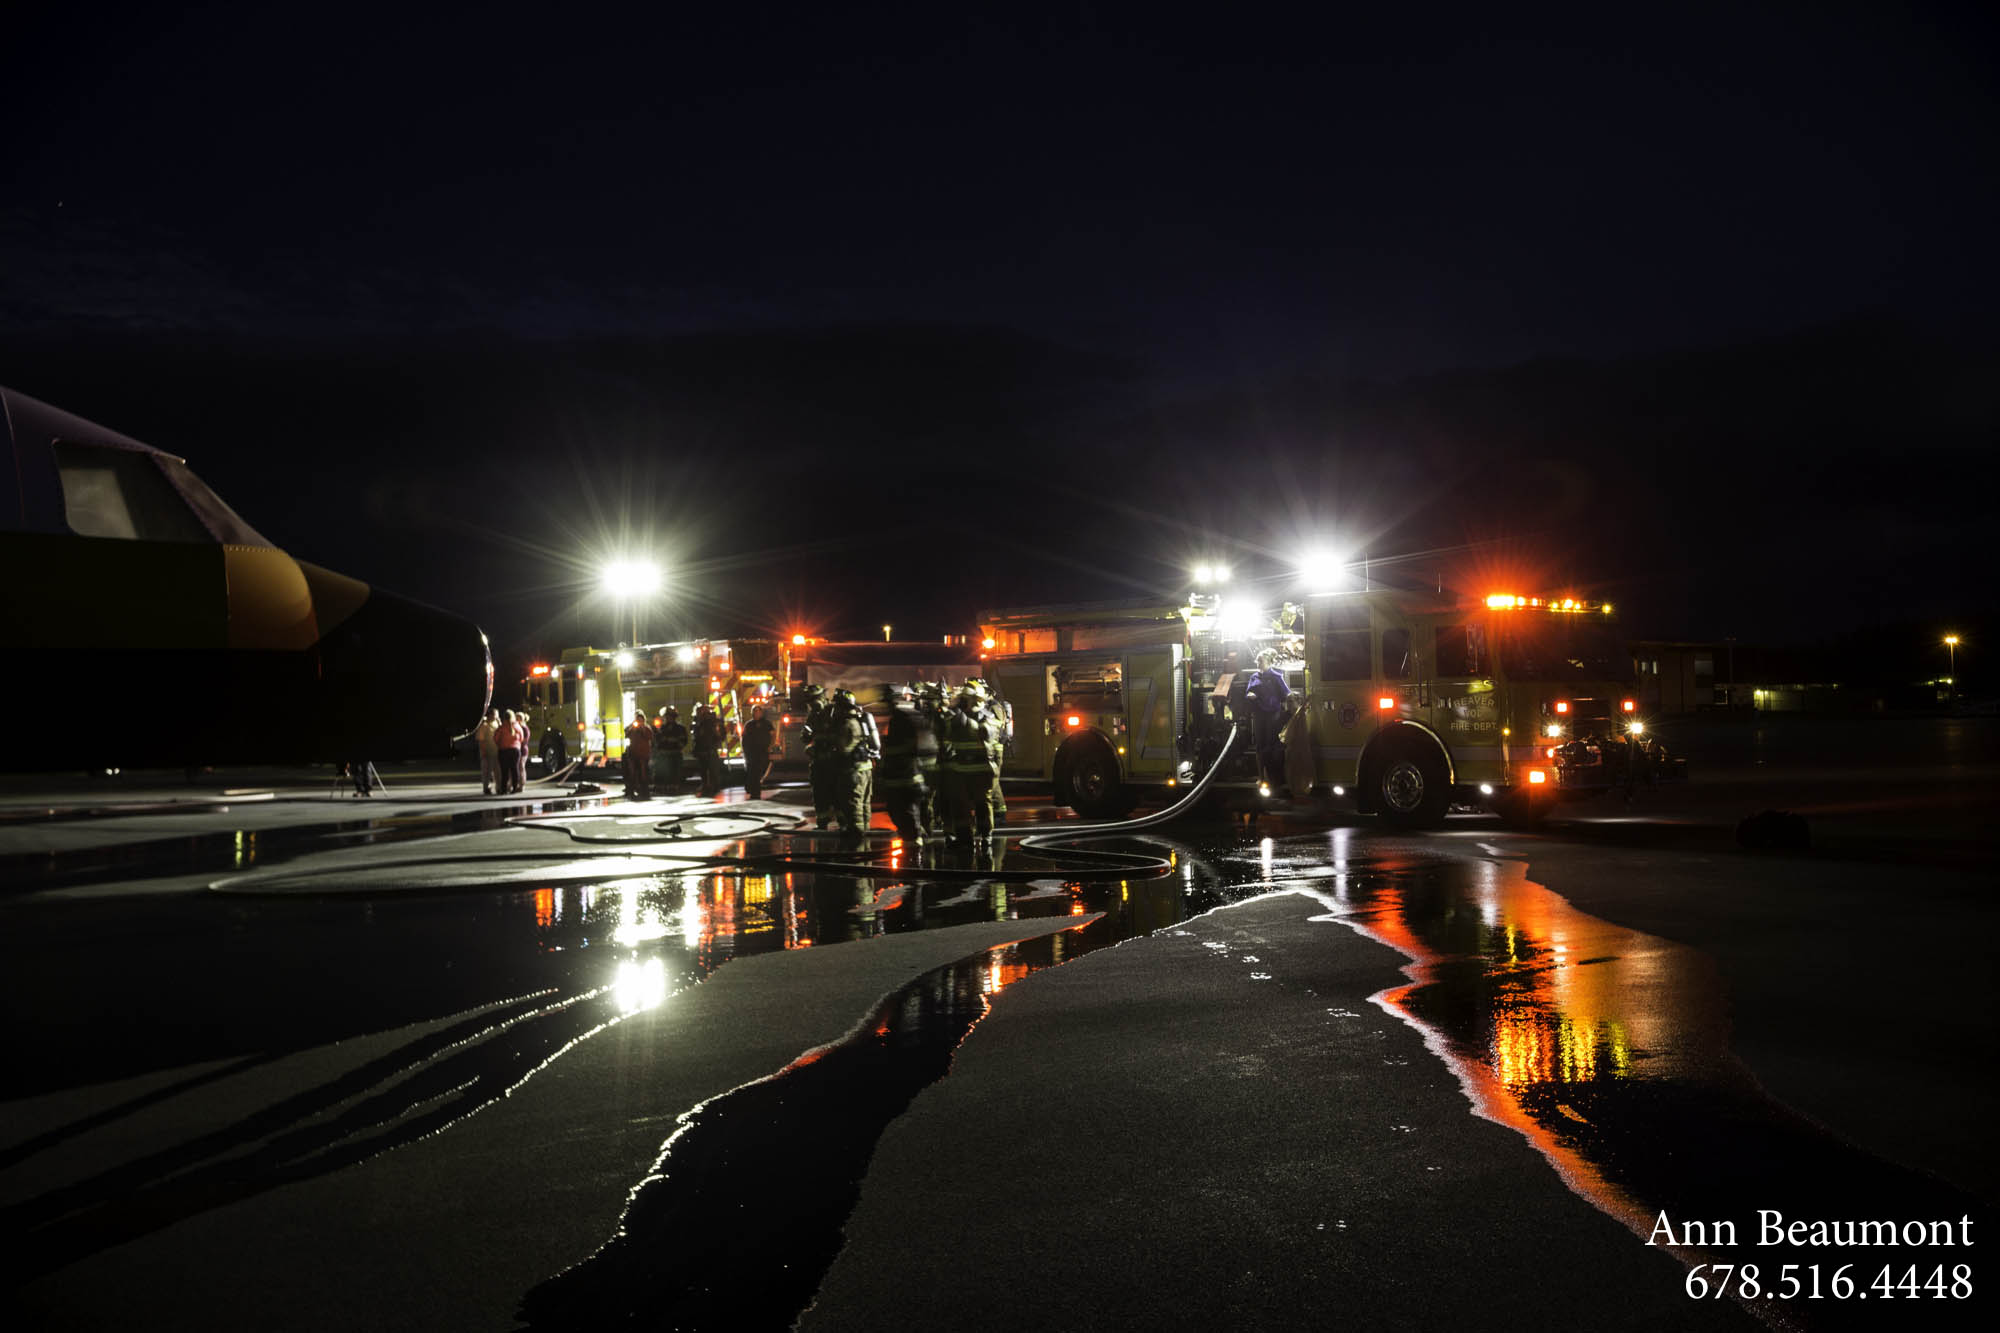 2014-01-14-rcma-aircraft-fire-training-14.jpg